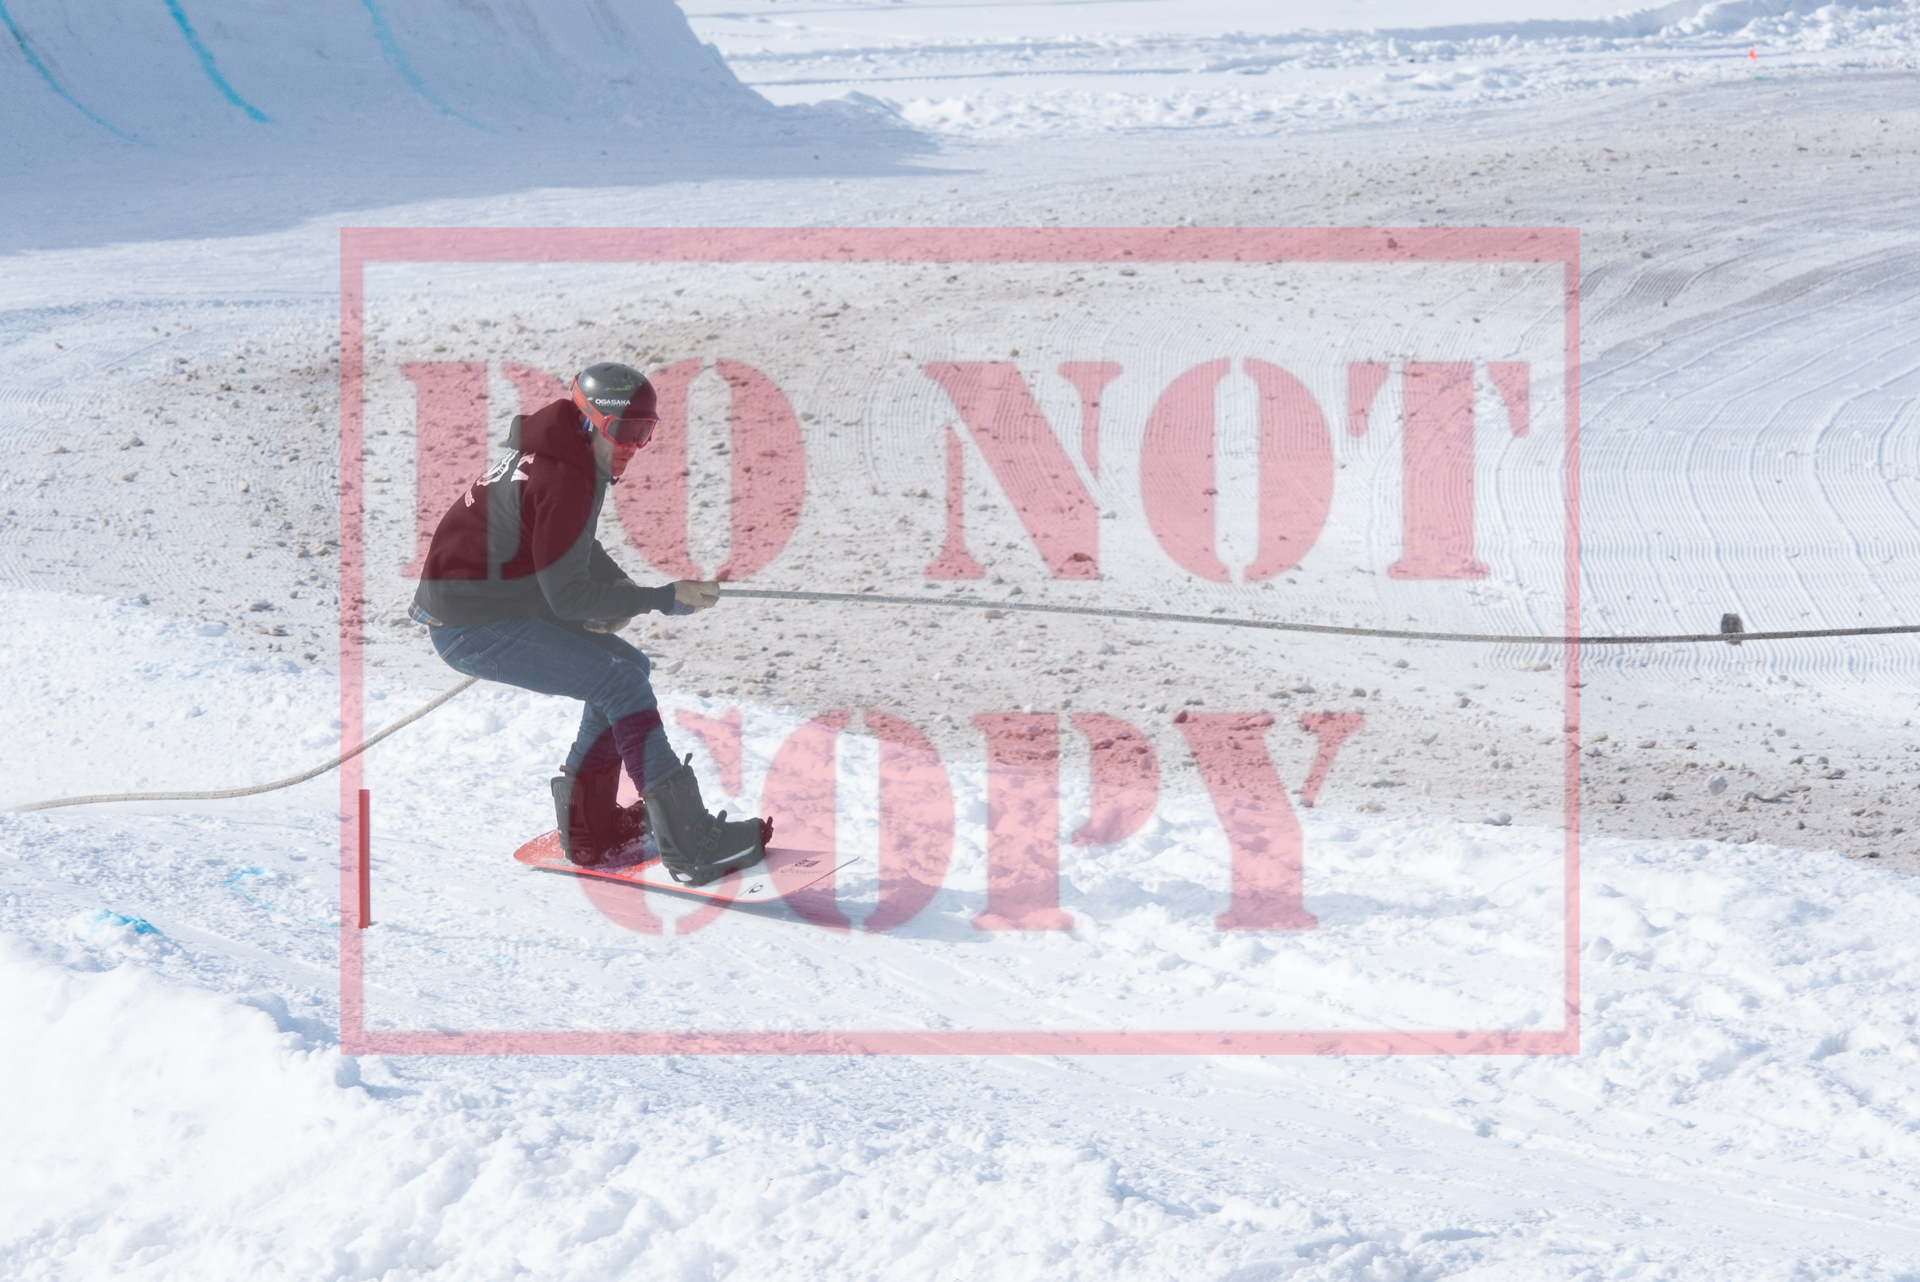 - Amanda Sandau - Snowboard 6